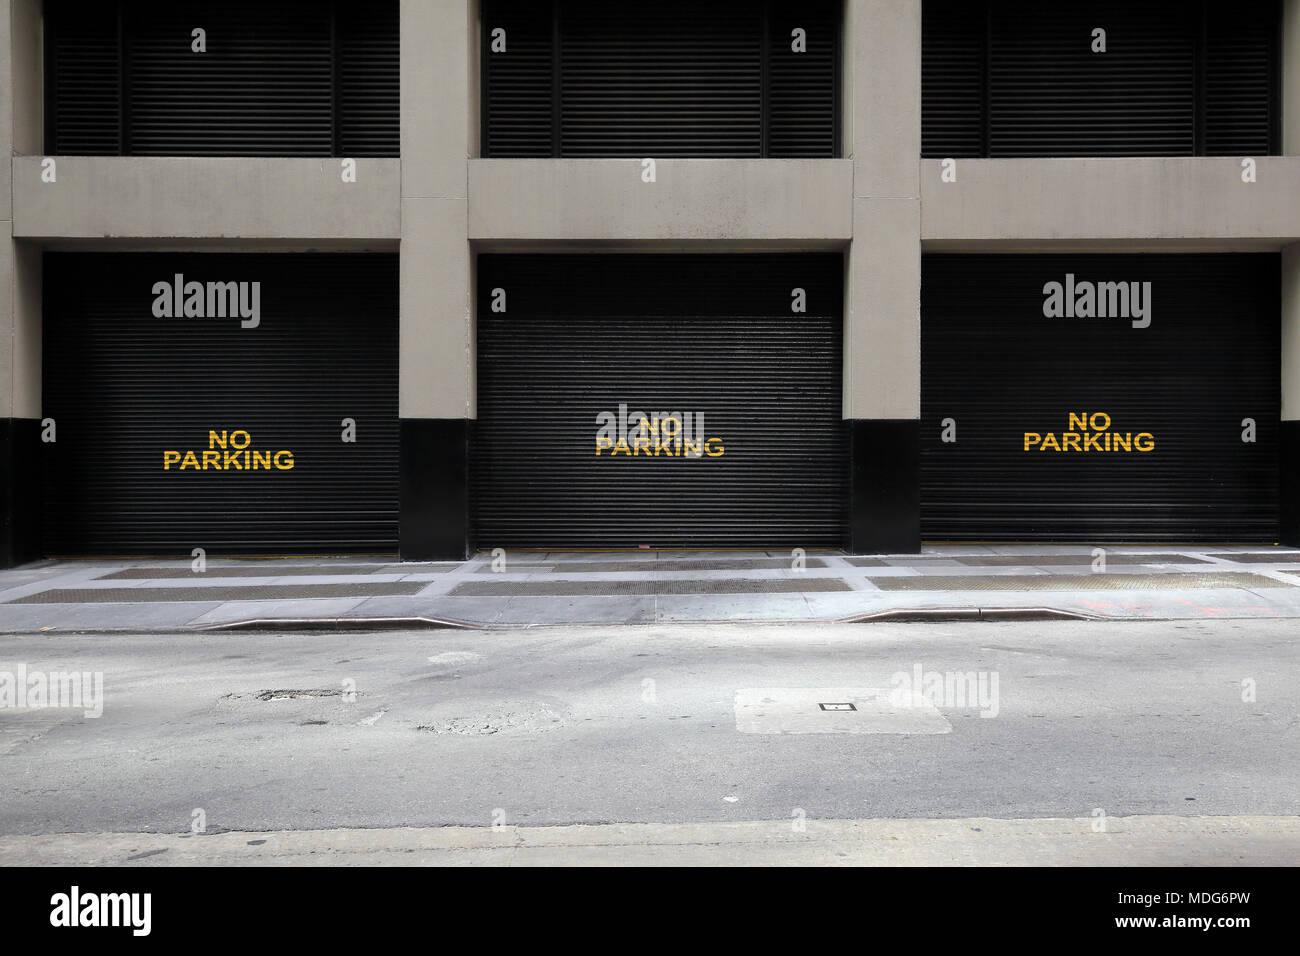 No parking written on loading dock doors, New York City - Stock Image